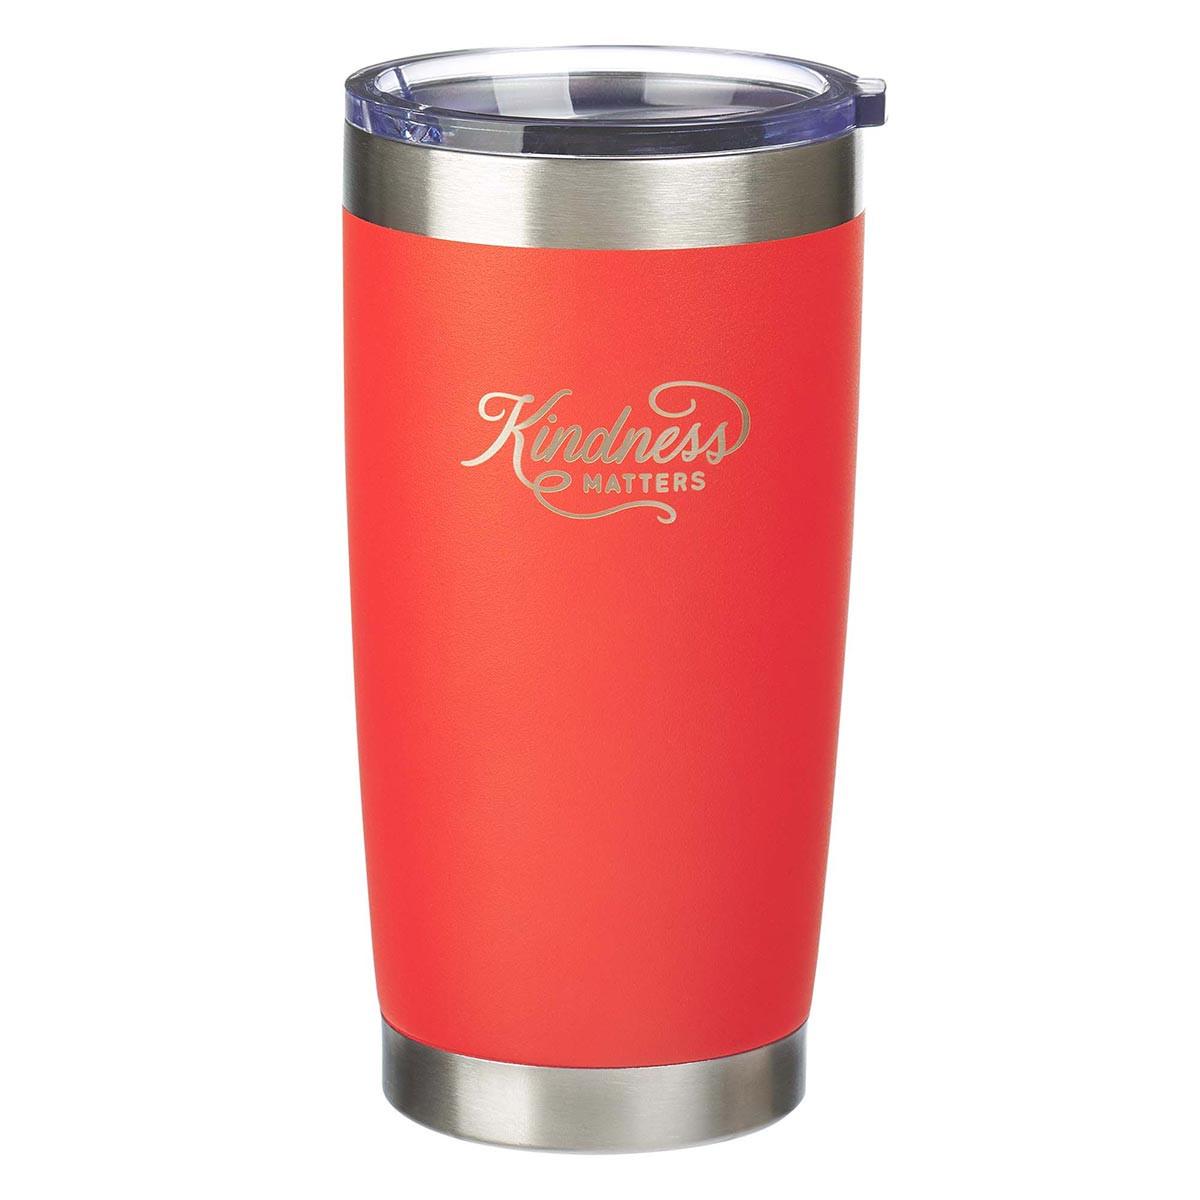 Kindness Matters Orange (Stainless Steel Mug)